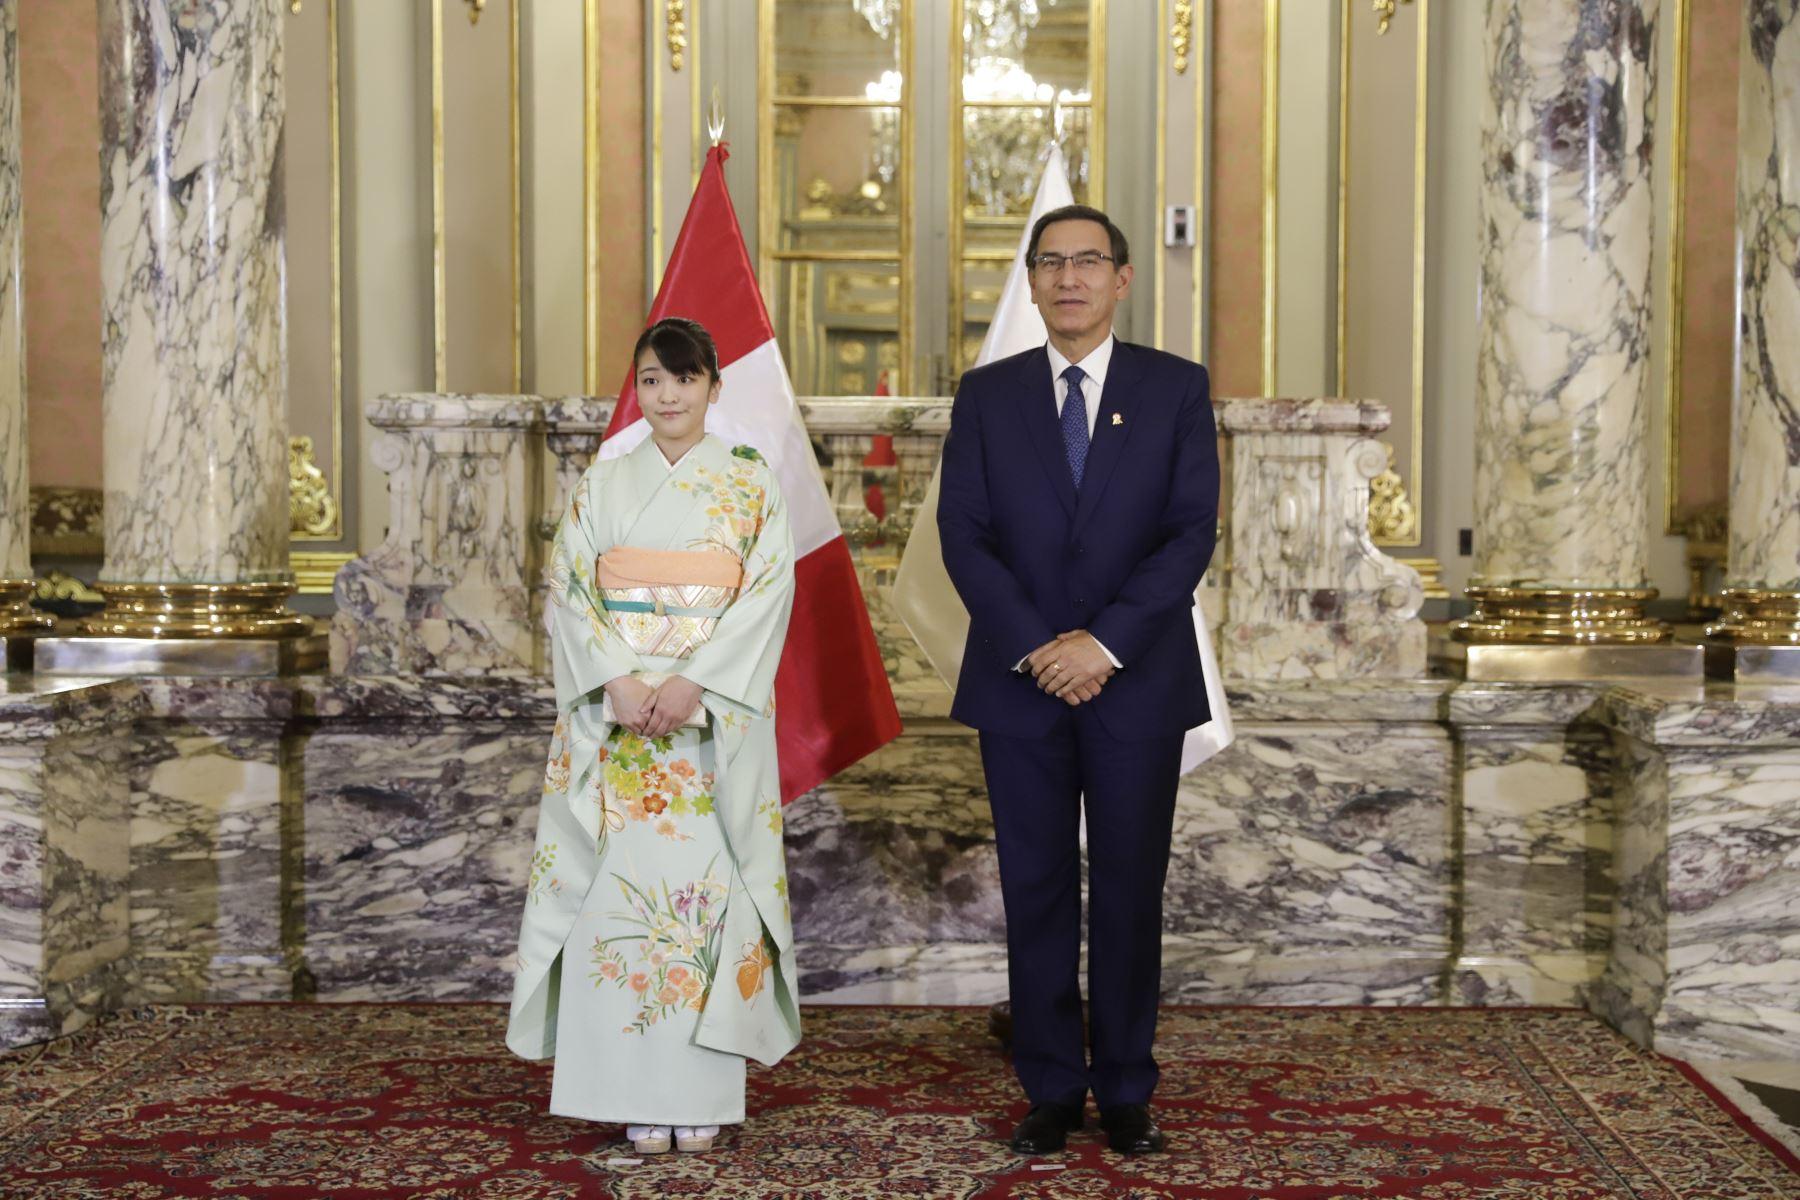 Presidente Vizcarra se reúne con princesa Mako de Japón. Foto: ANDINA/ Prensa Presidencia